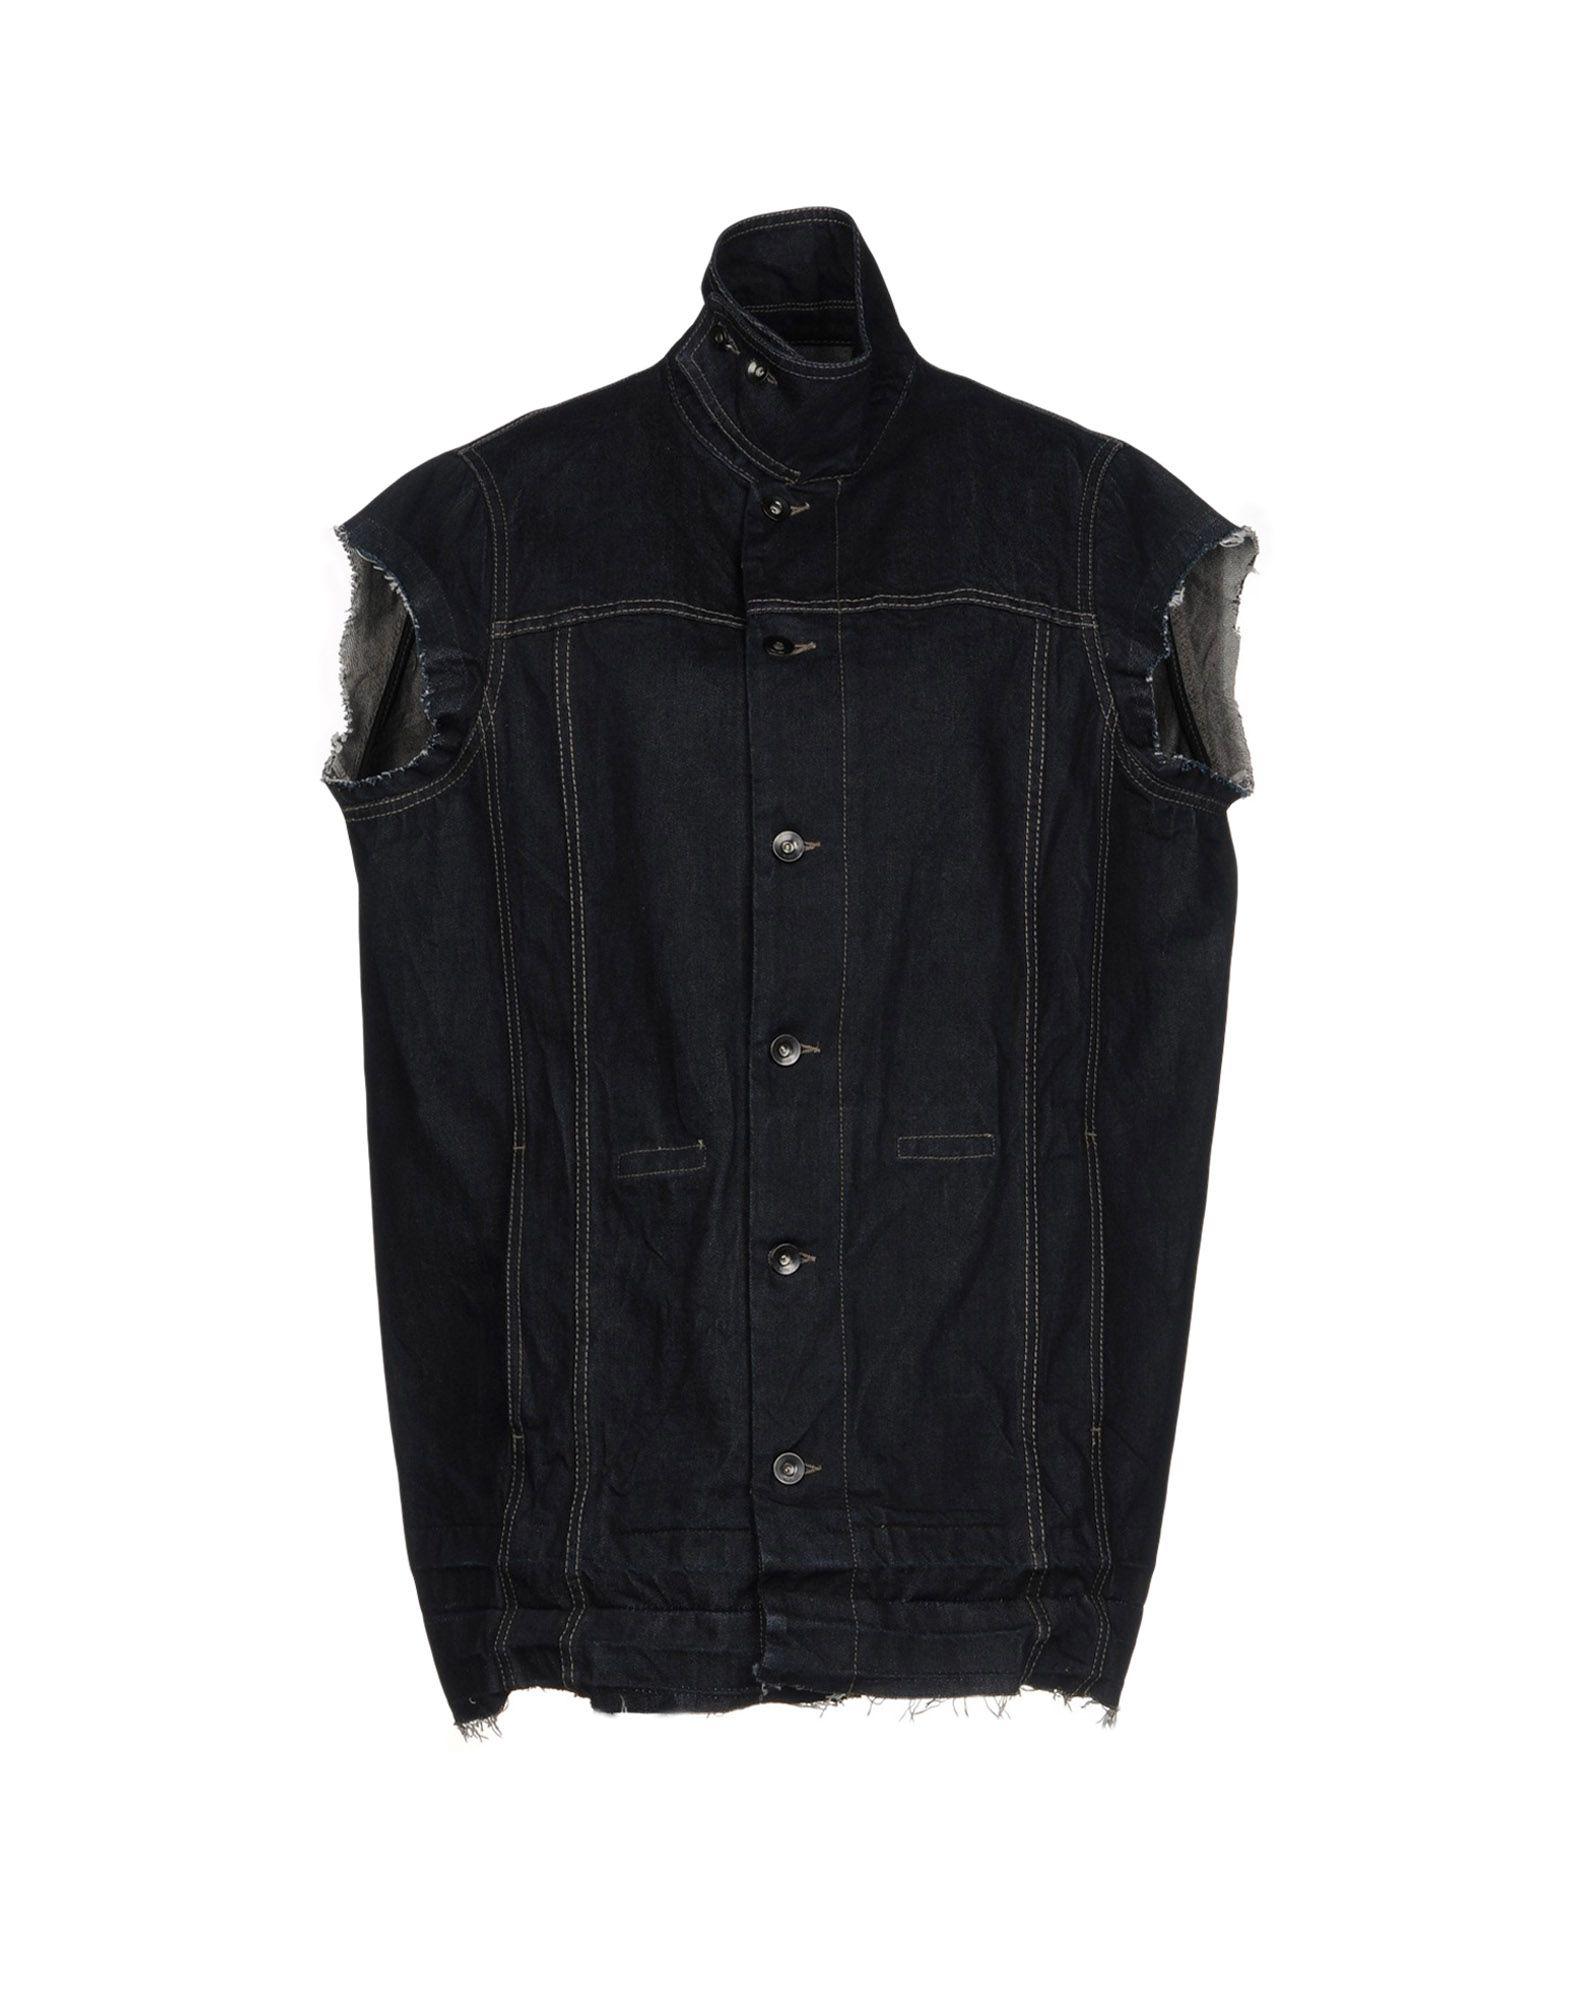 DRKSHDW by RICK OWENS Джинсовая верхняя одежда пуловер quelle rick cardona by heine 11820